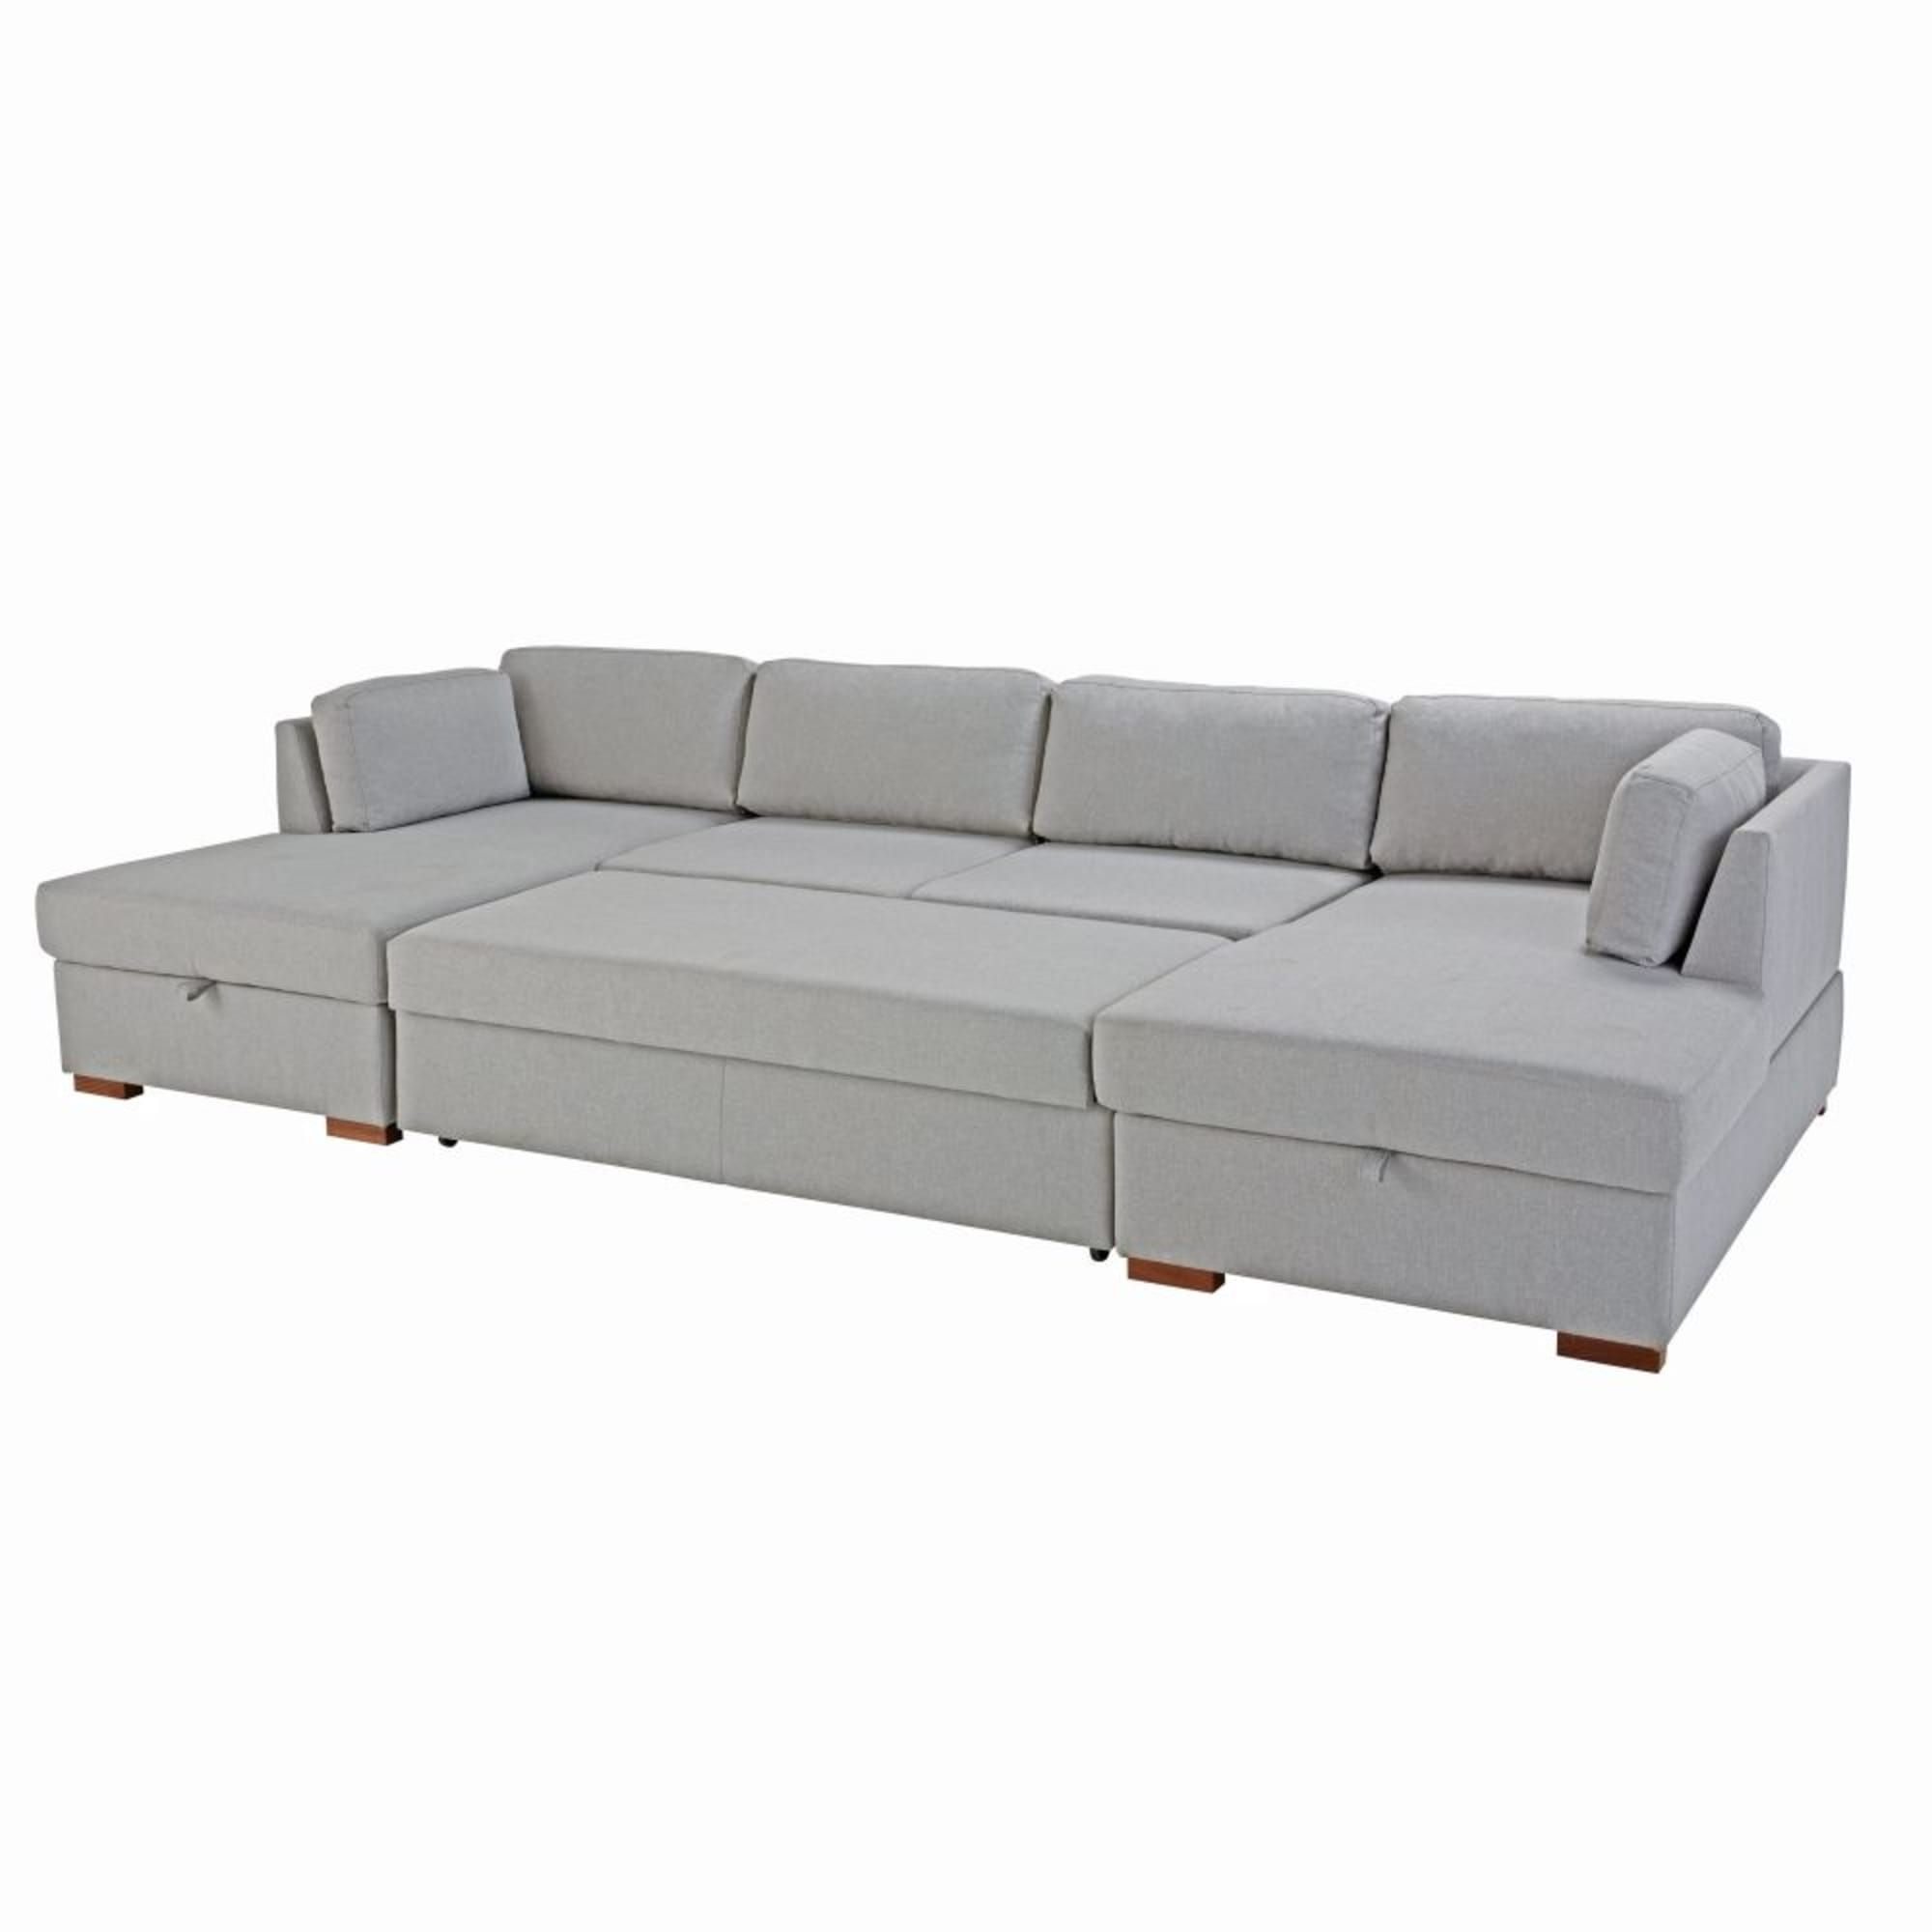 Light Grey 7 Seater U Shaped Sofa Bed Times Square Maisons Du Monde U Shaped Sofa Bed